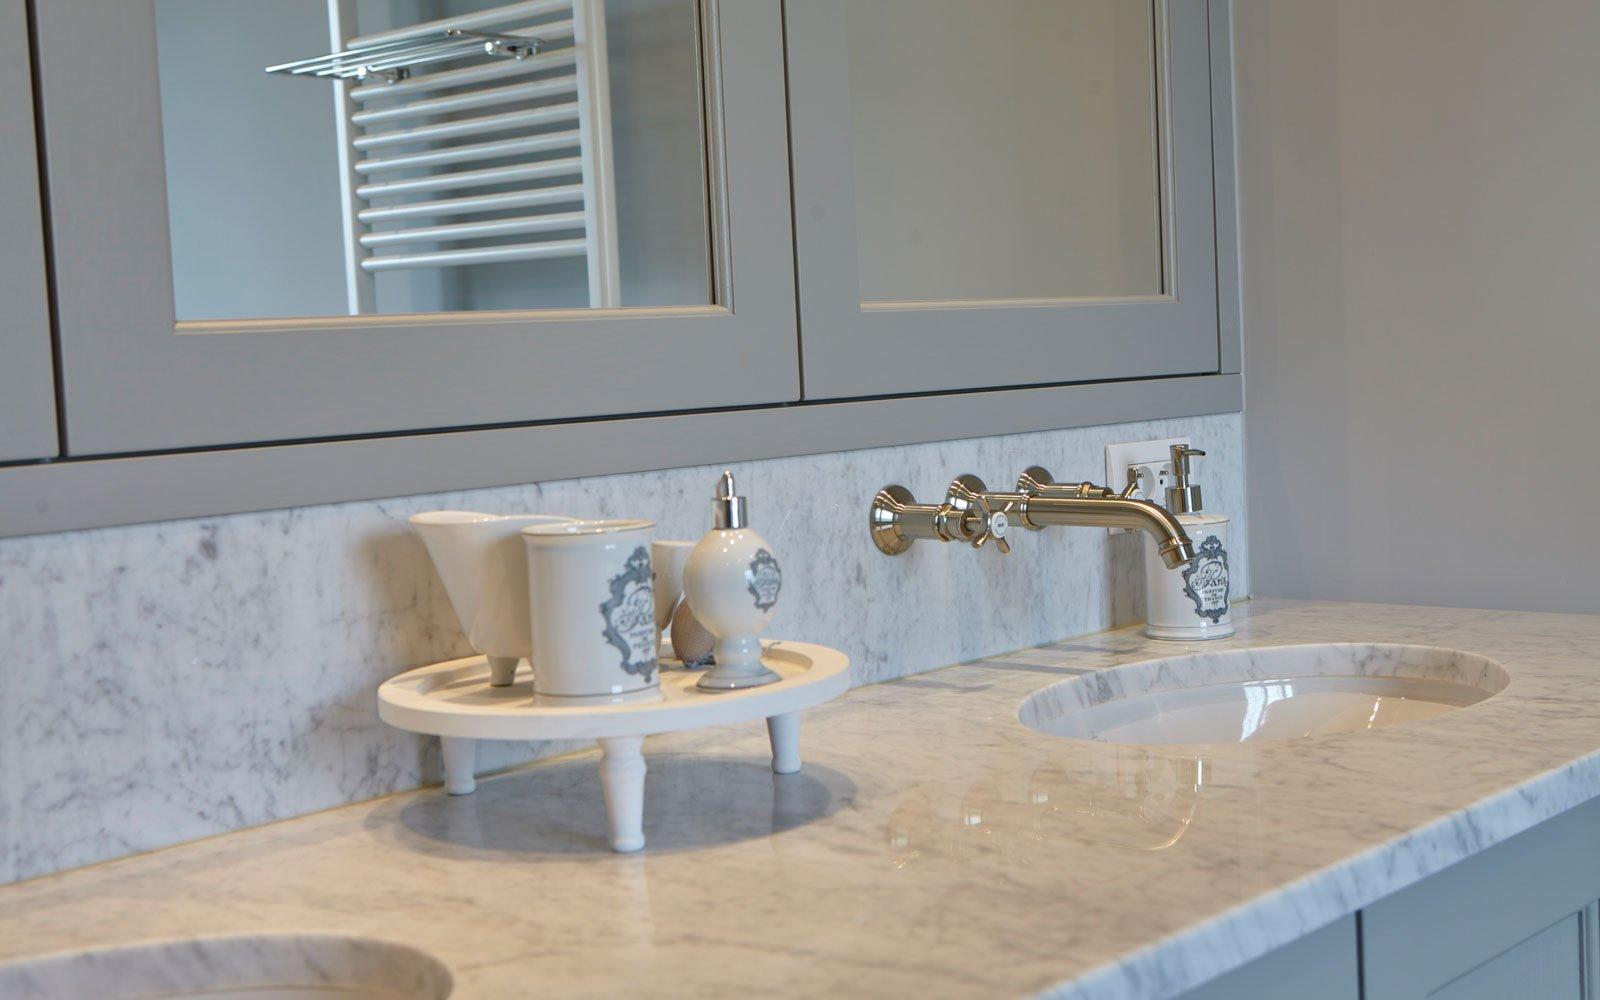 Badkamer, natuursteen, wastafel, sanitair, Tanghe Philip bvba, Engelse cottage, Bart François